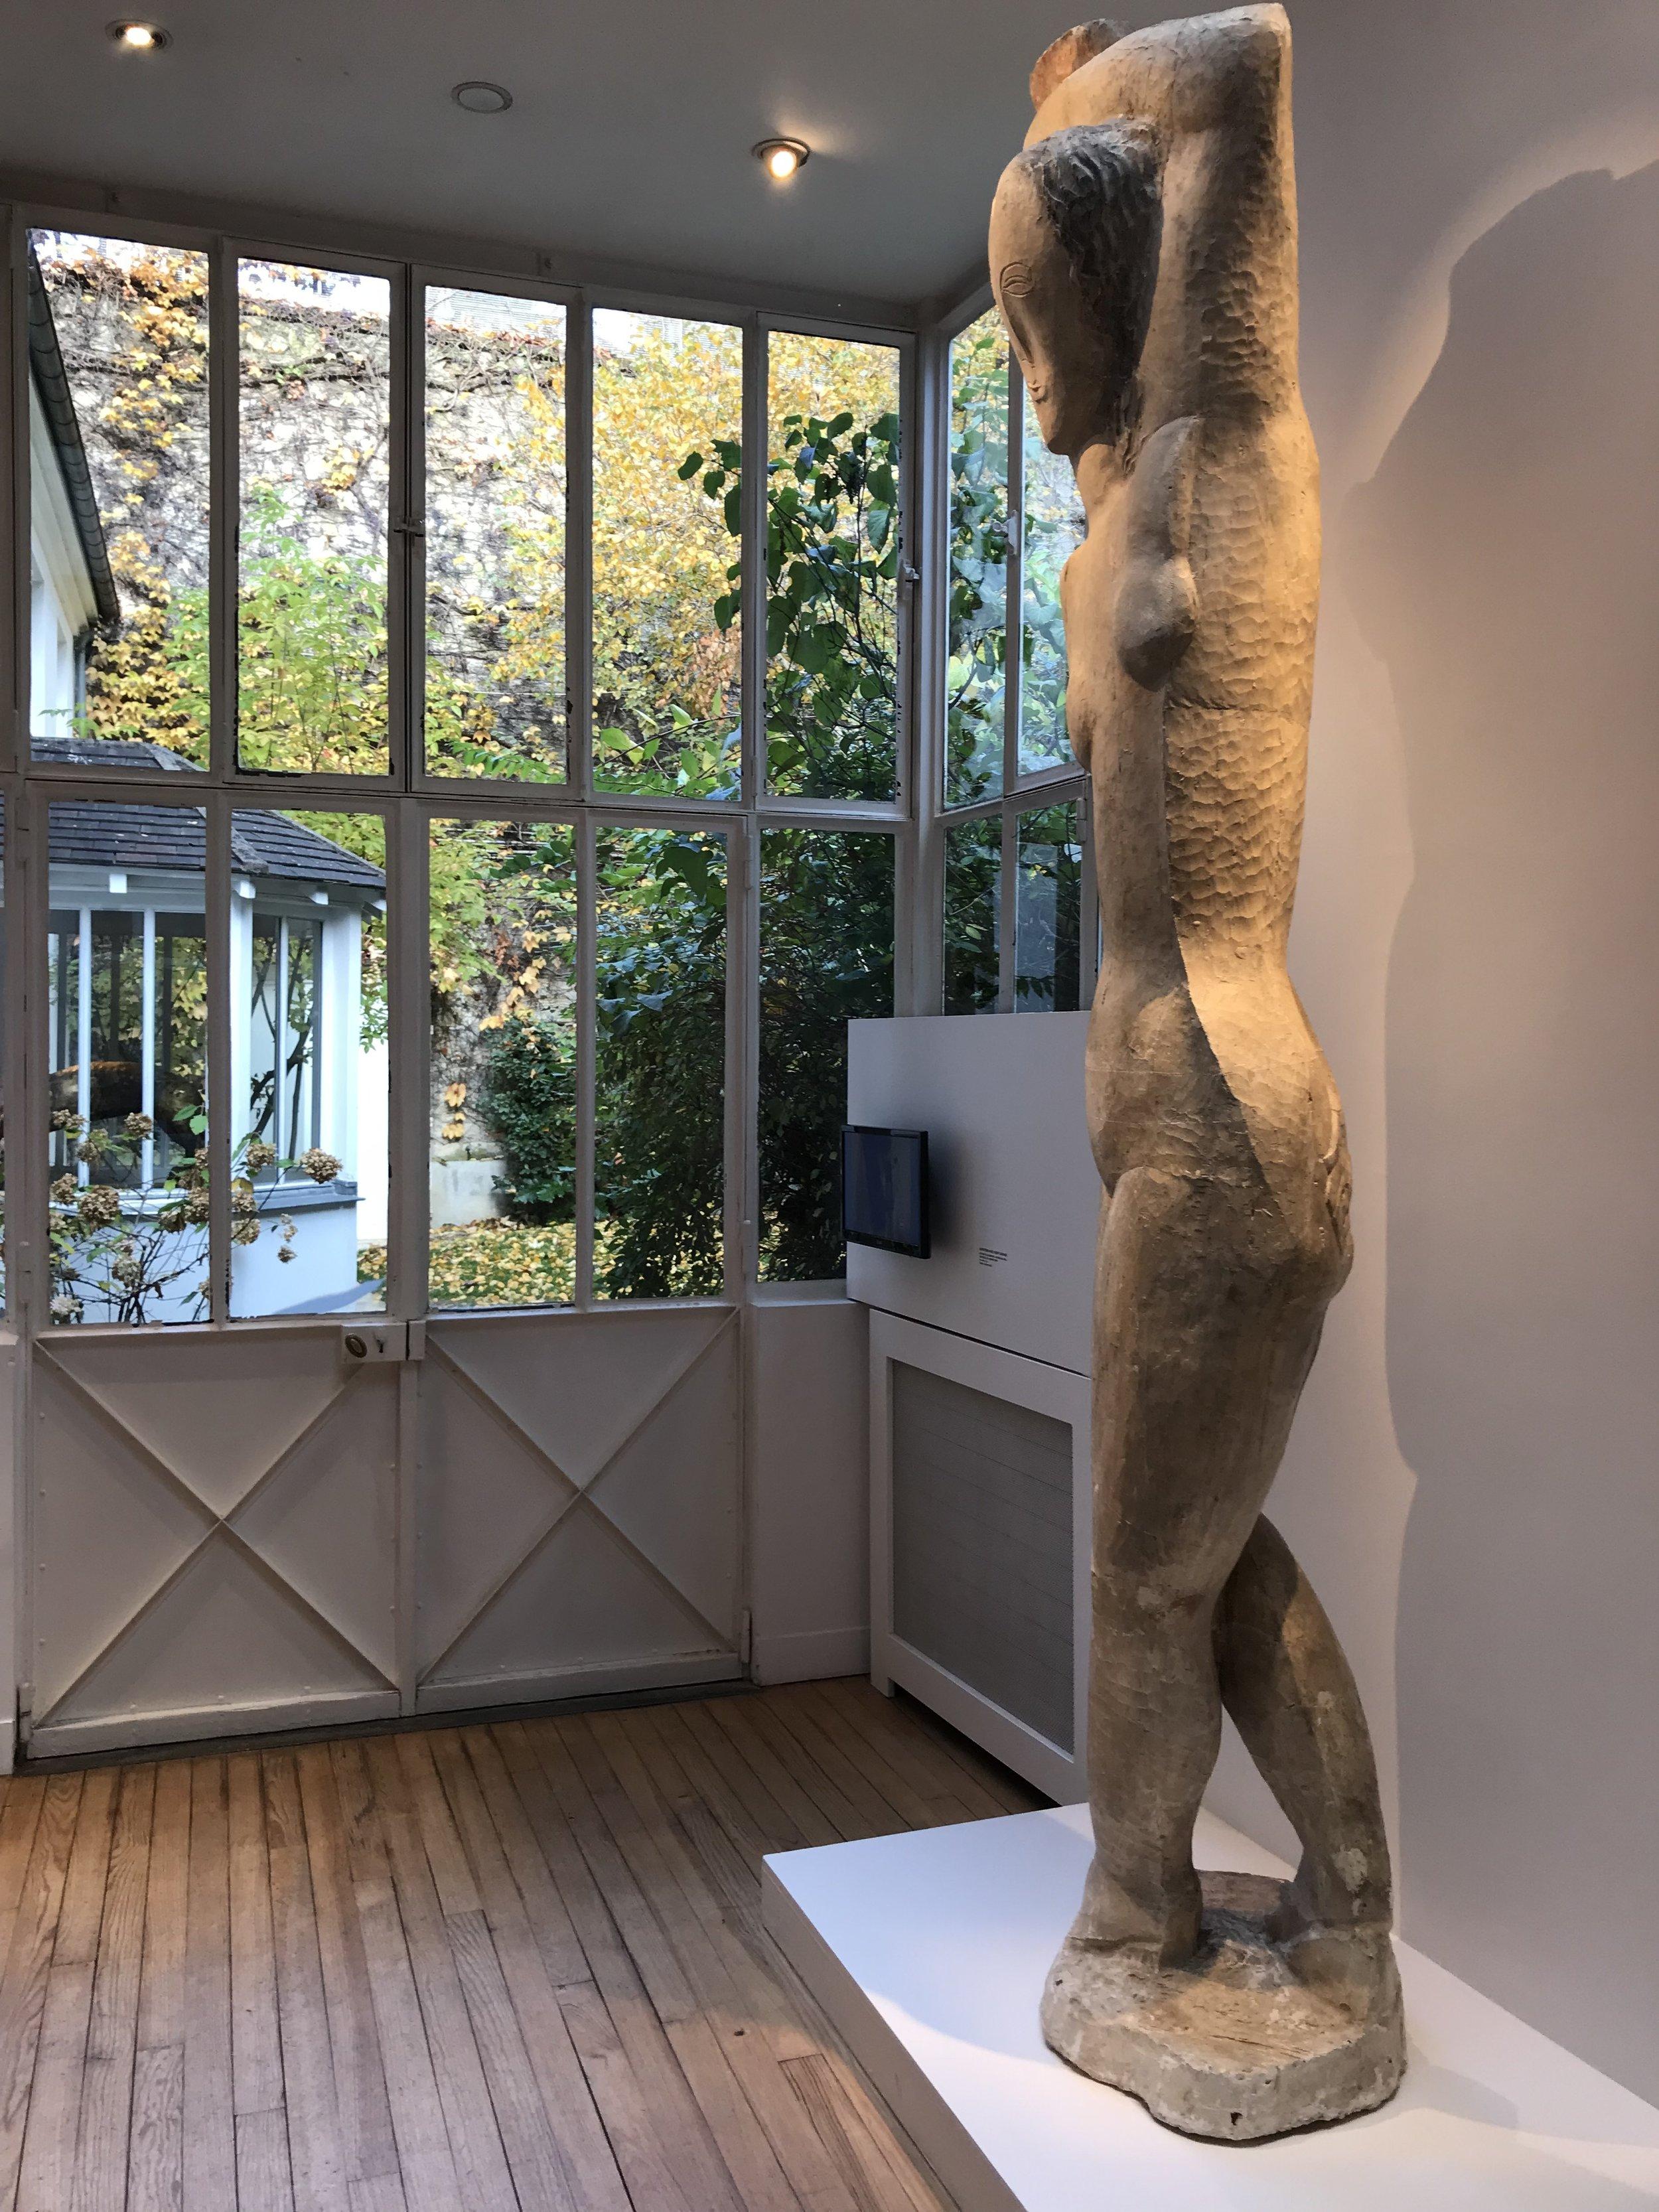 Zadkine museum - visiting Paris with kids